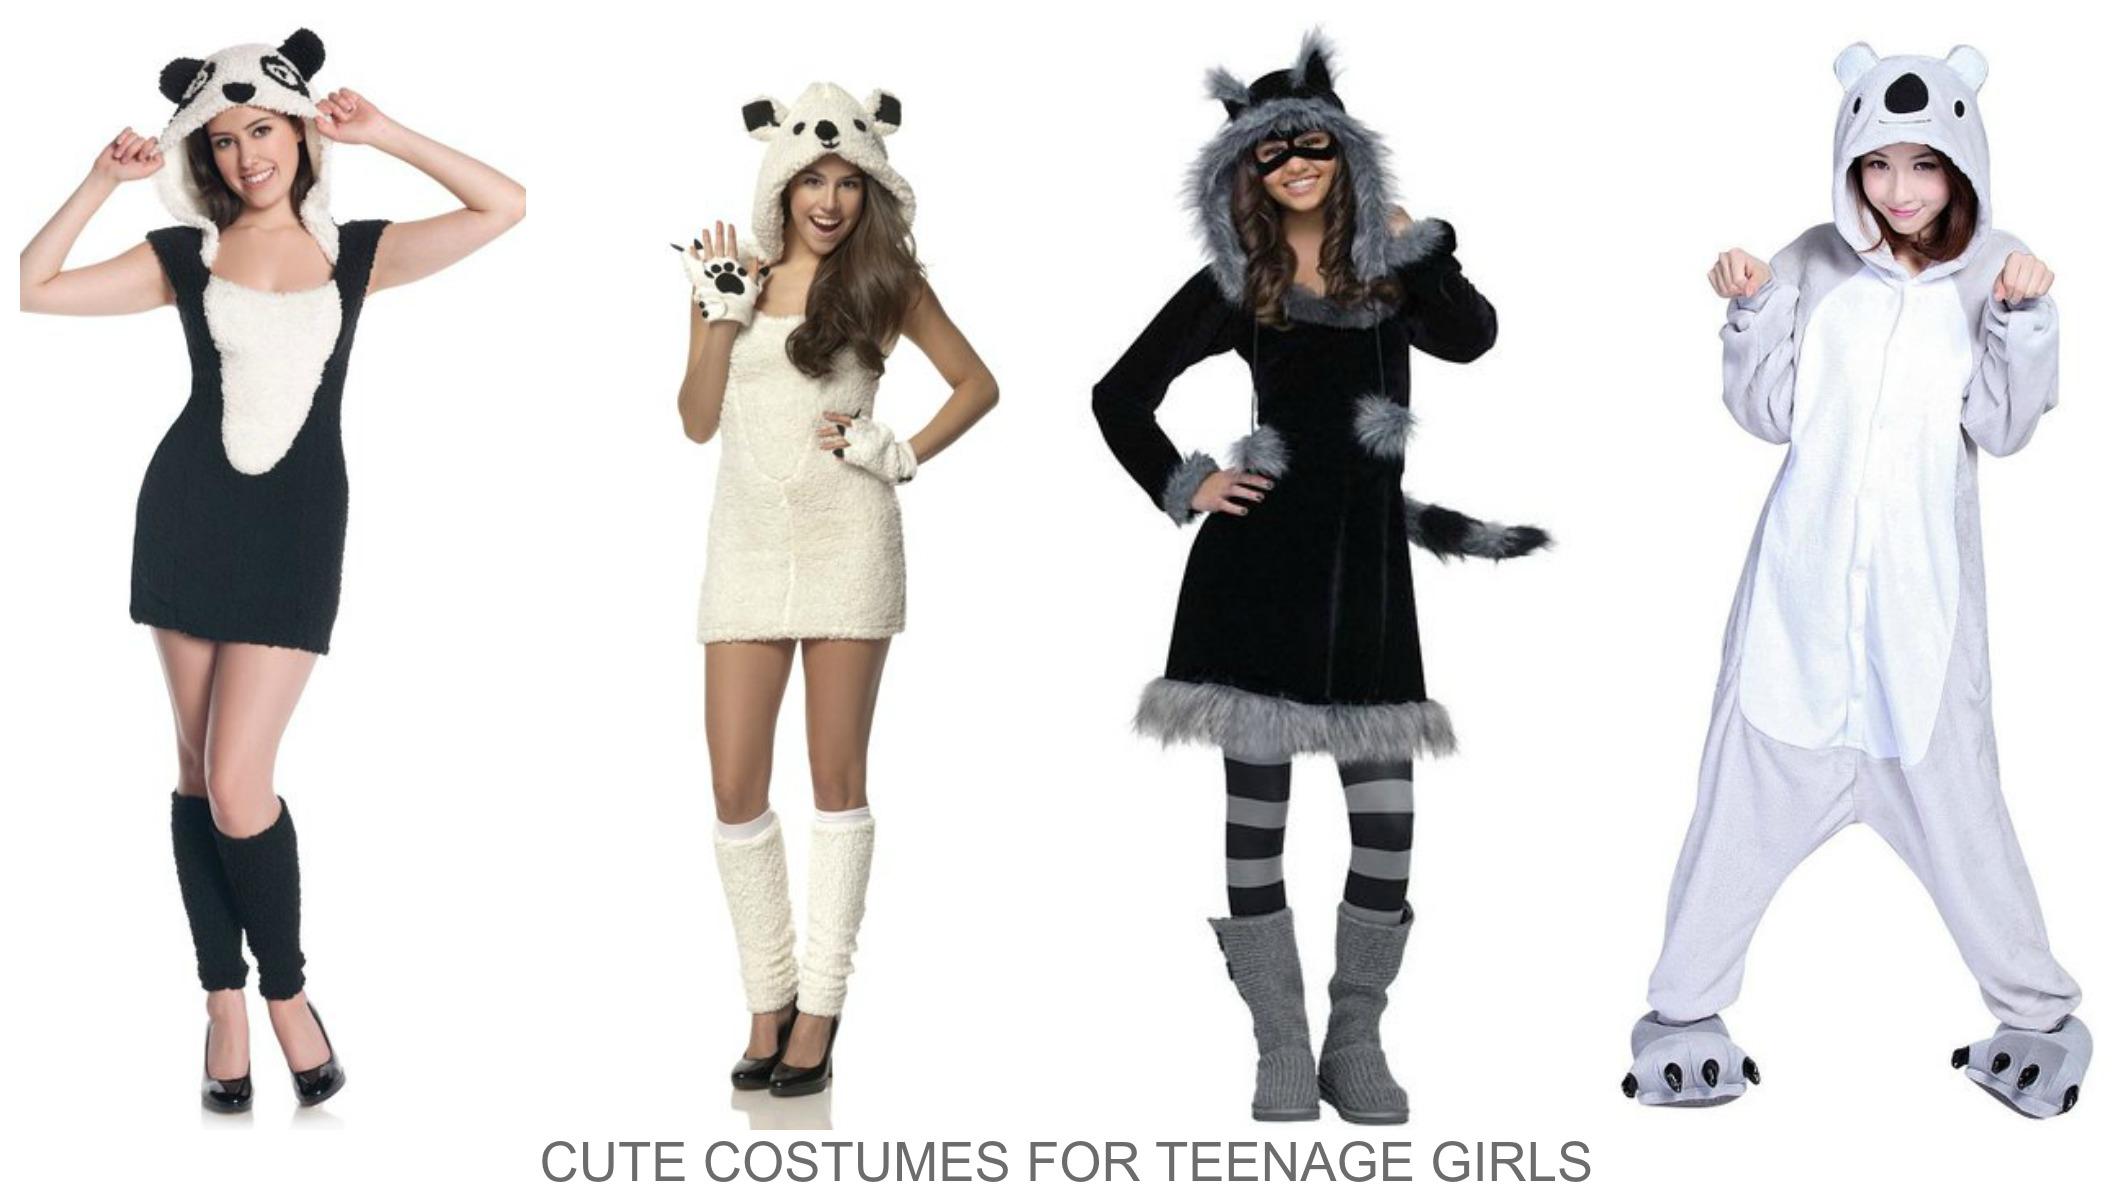 CUTE COSTUMES FOR TEENAGE GIRLS